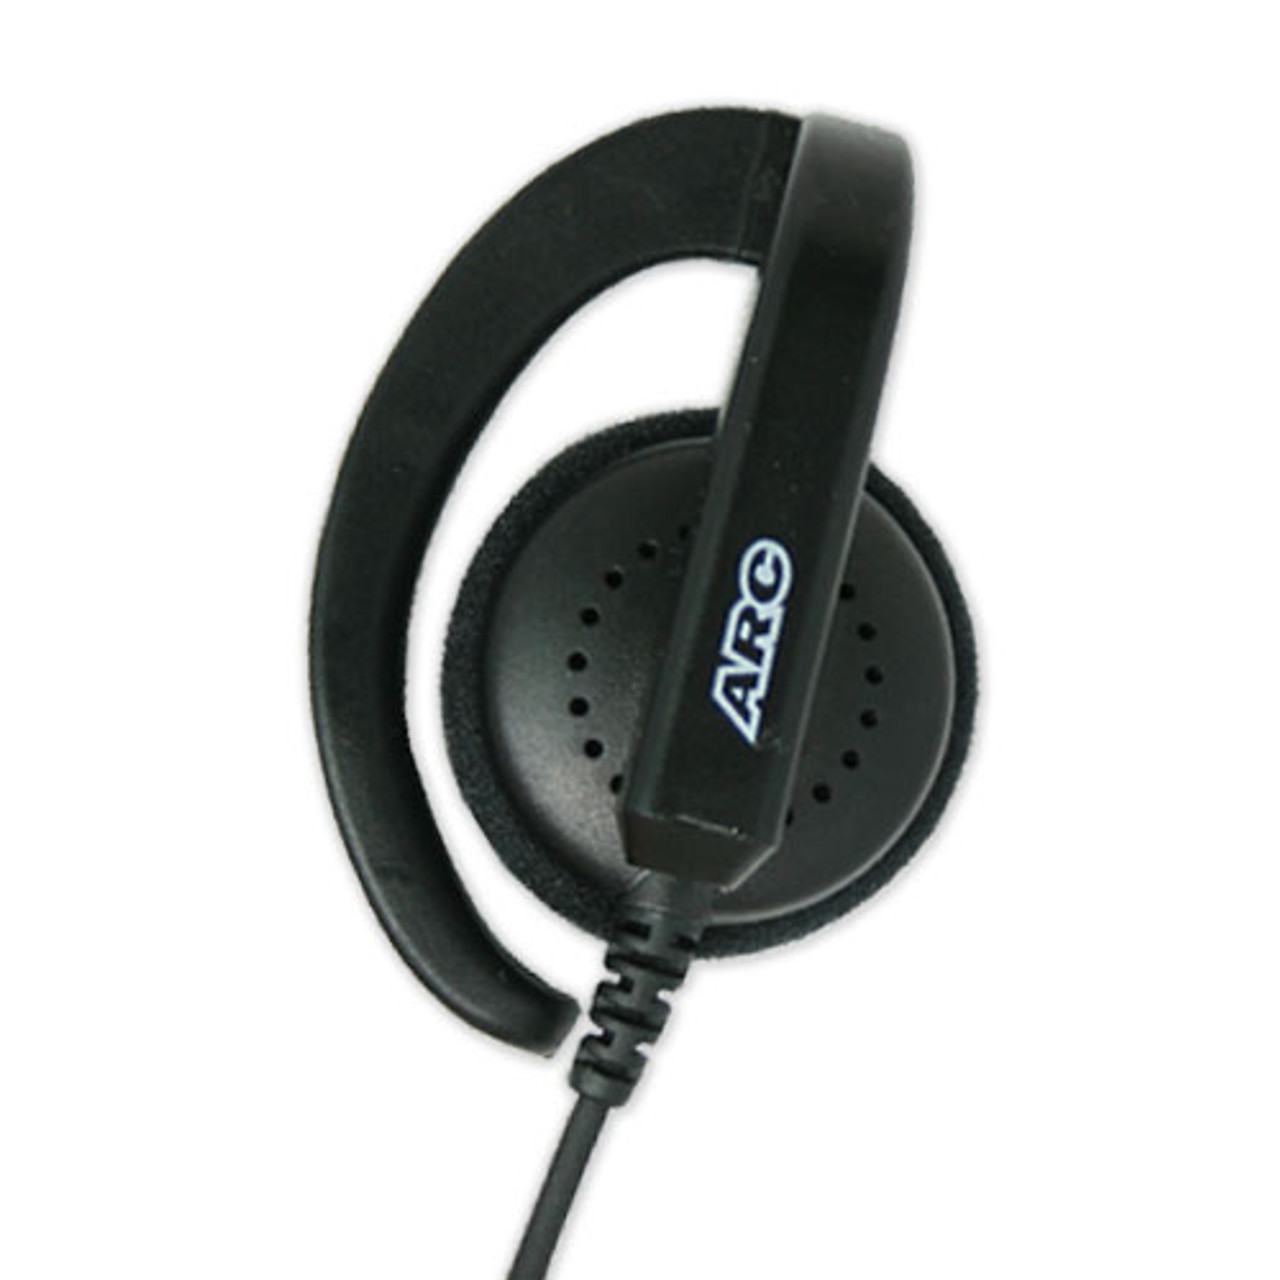 G32 Noise Canceling Headset for Kenwood or Motorola two way radios